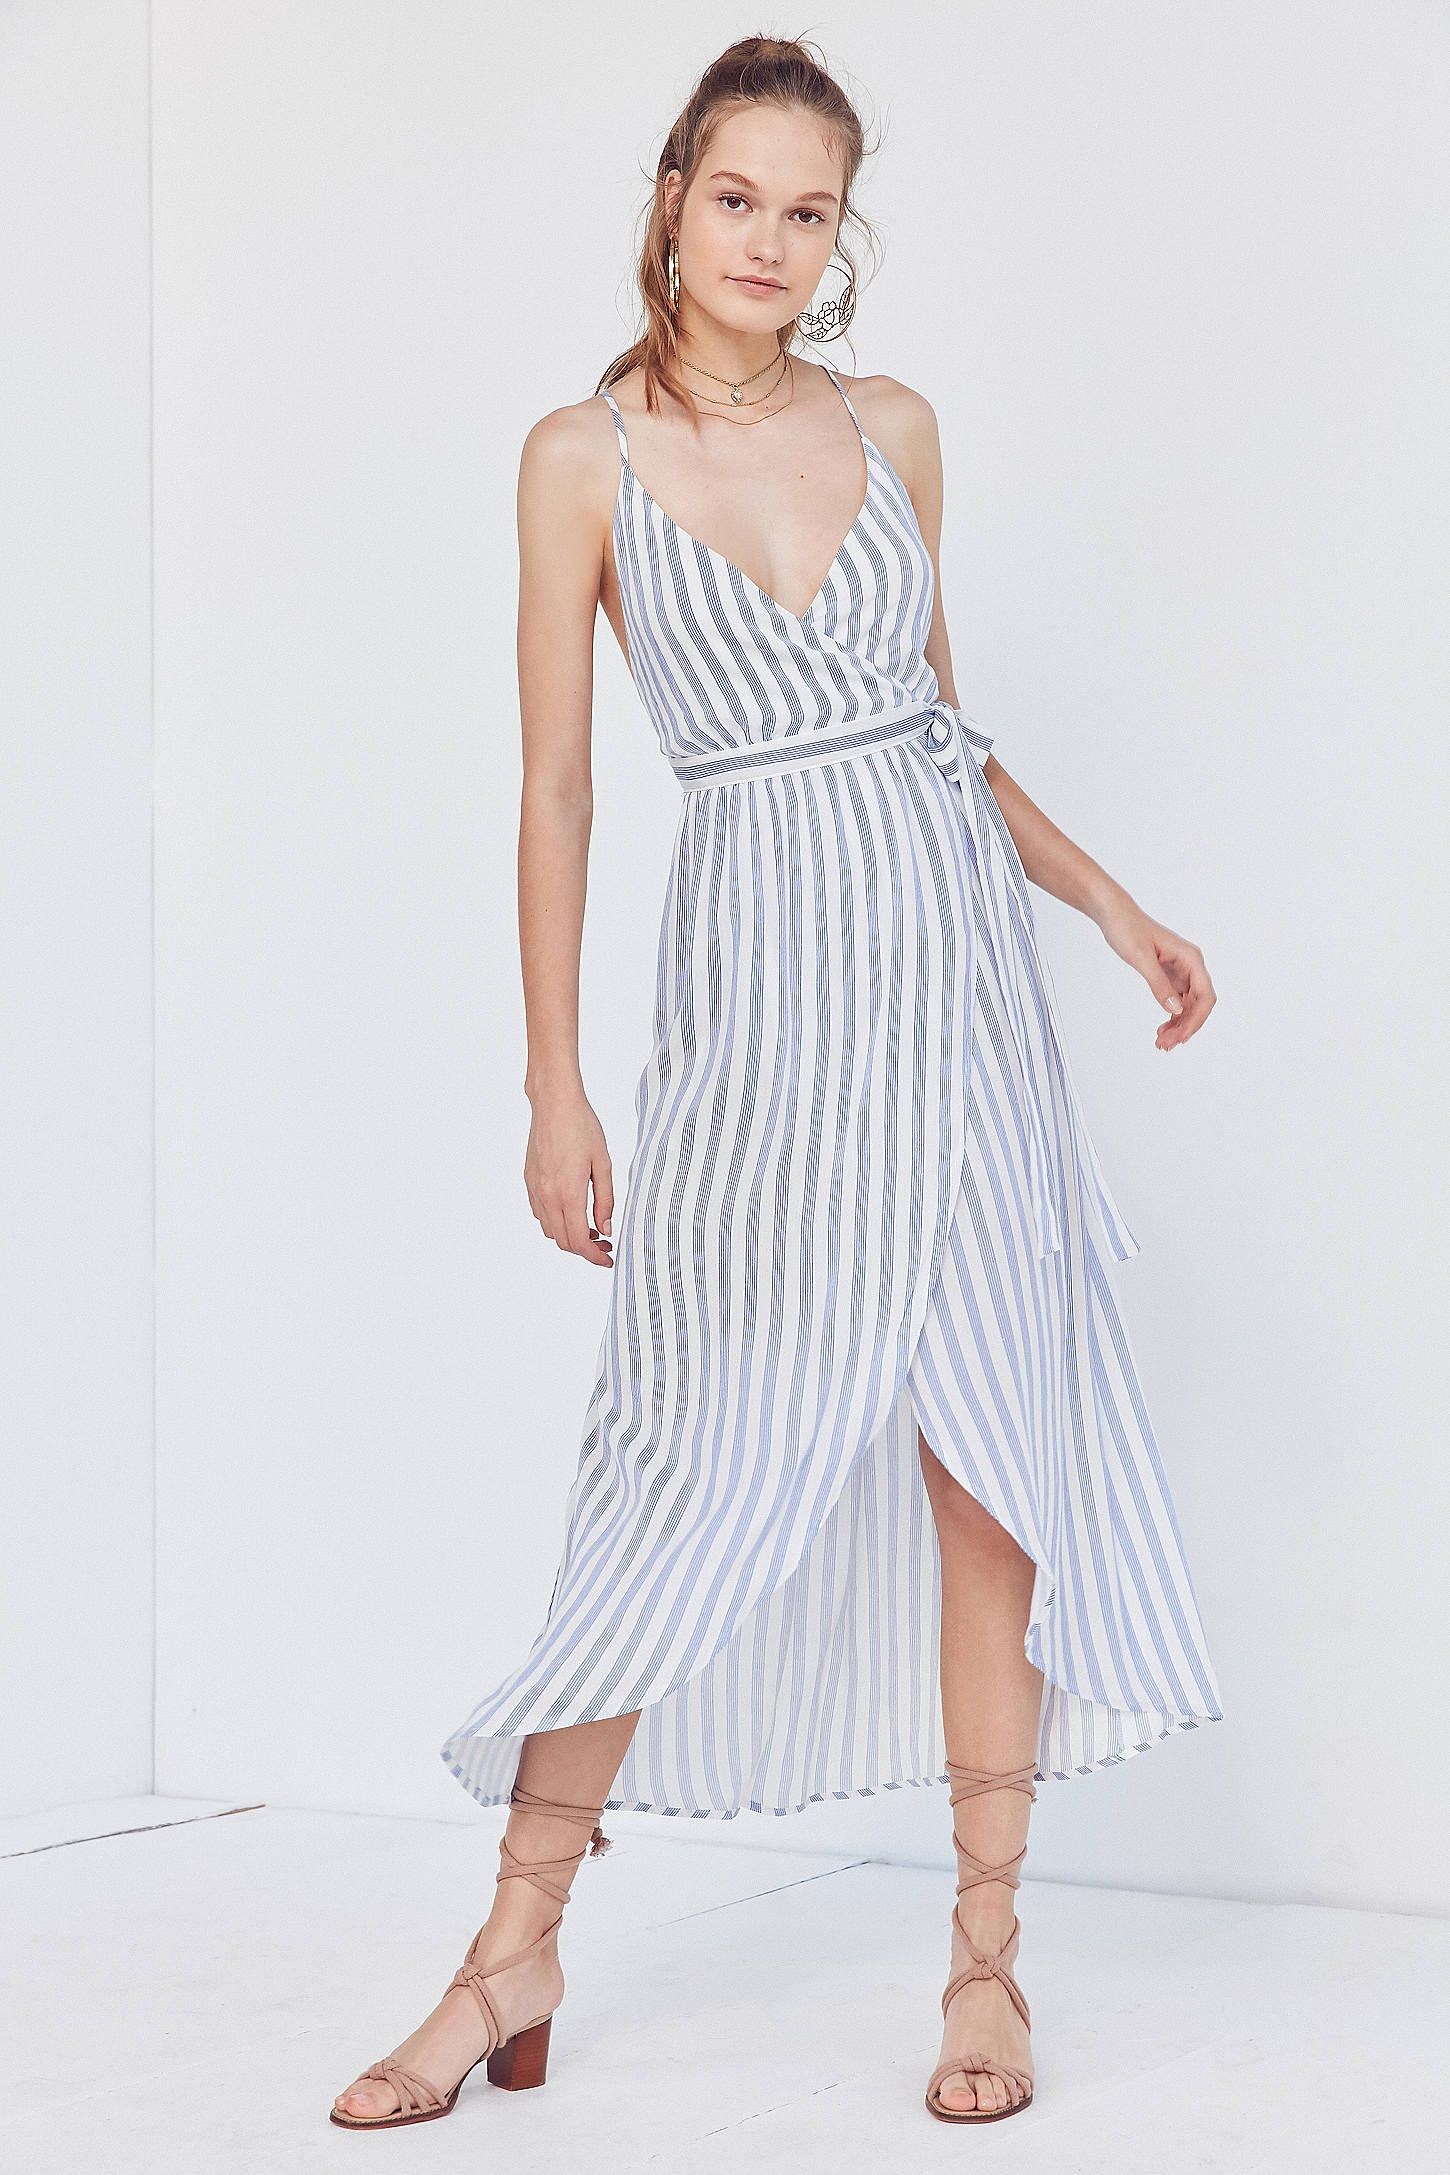 Slide View 1 Cooperative Striped Maxi Wrap Dress Maxi Wrap Dress Plunge Maxi Dress Fashion [ 2175 x 1450 Pixel ]